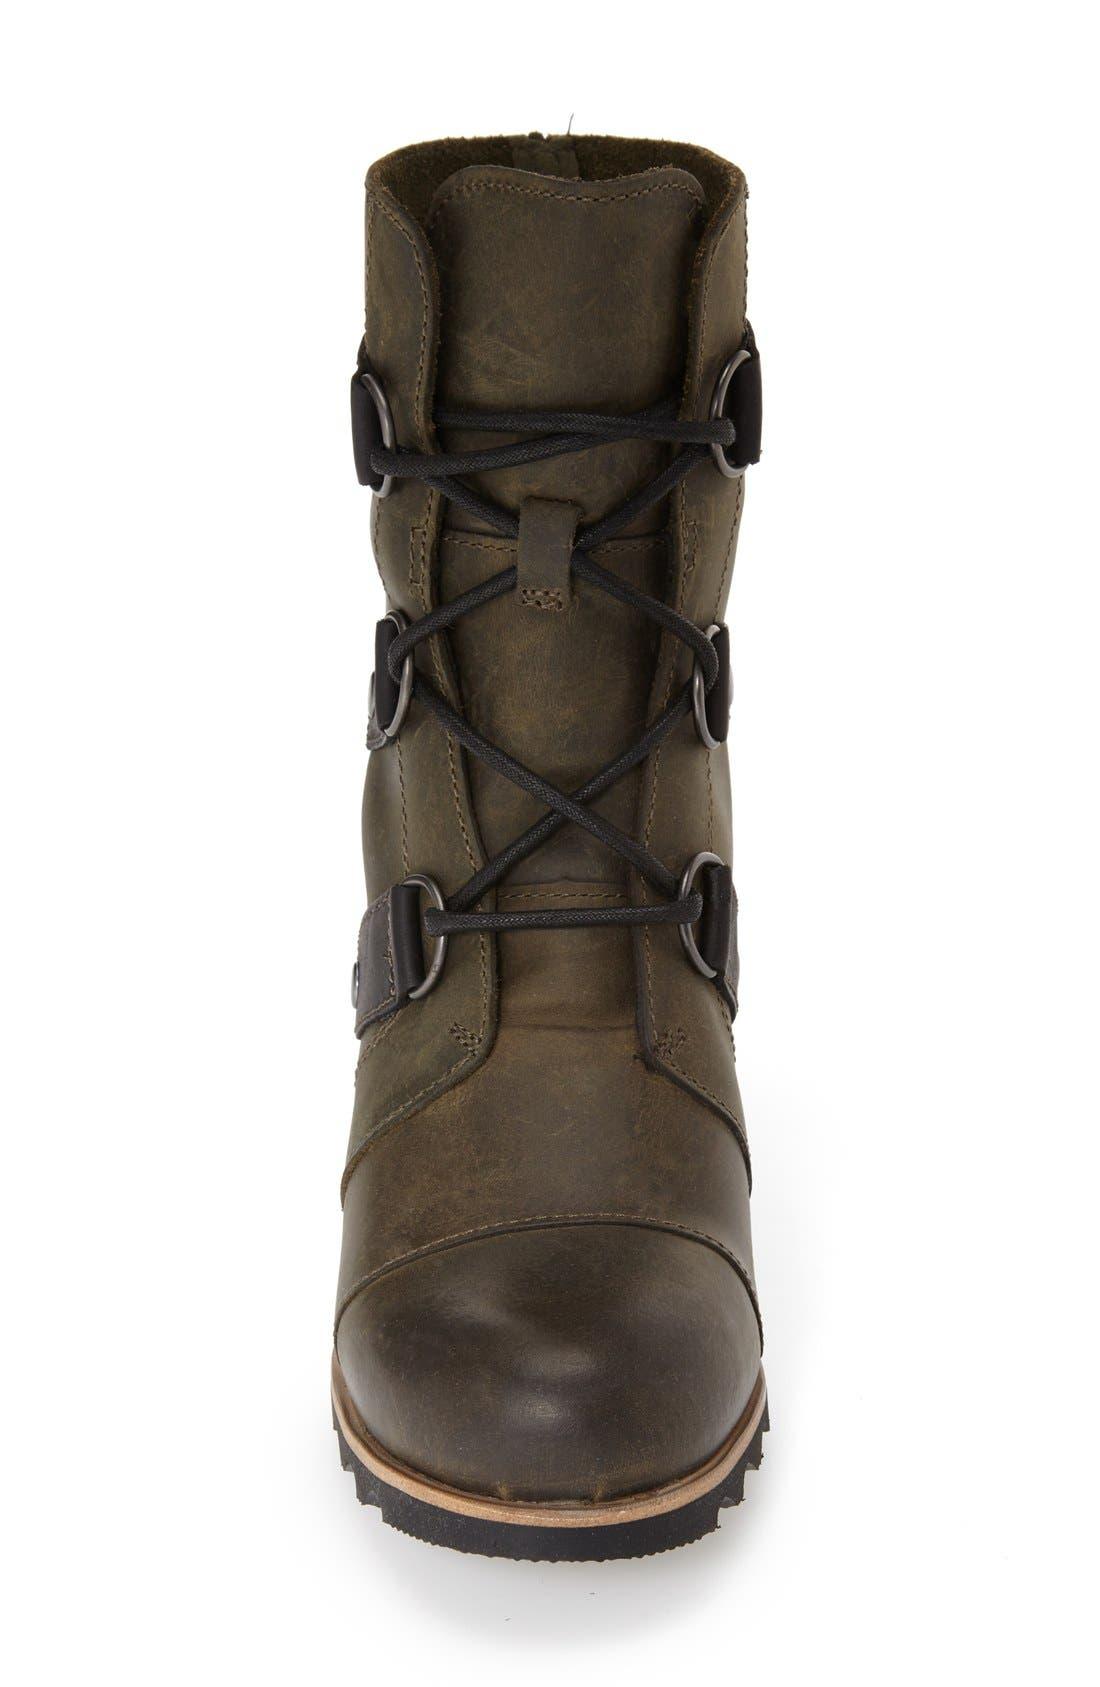 'Joan of Arctic' Waterproof Wedge Boot,                             Alternate thumbnail 3, color,                             Nori Green Leather